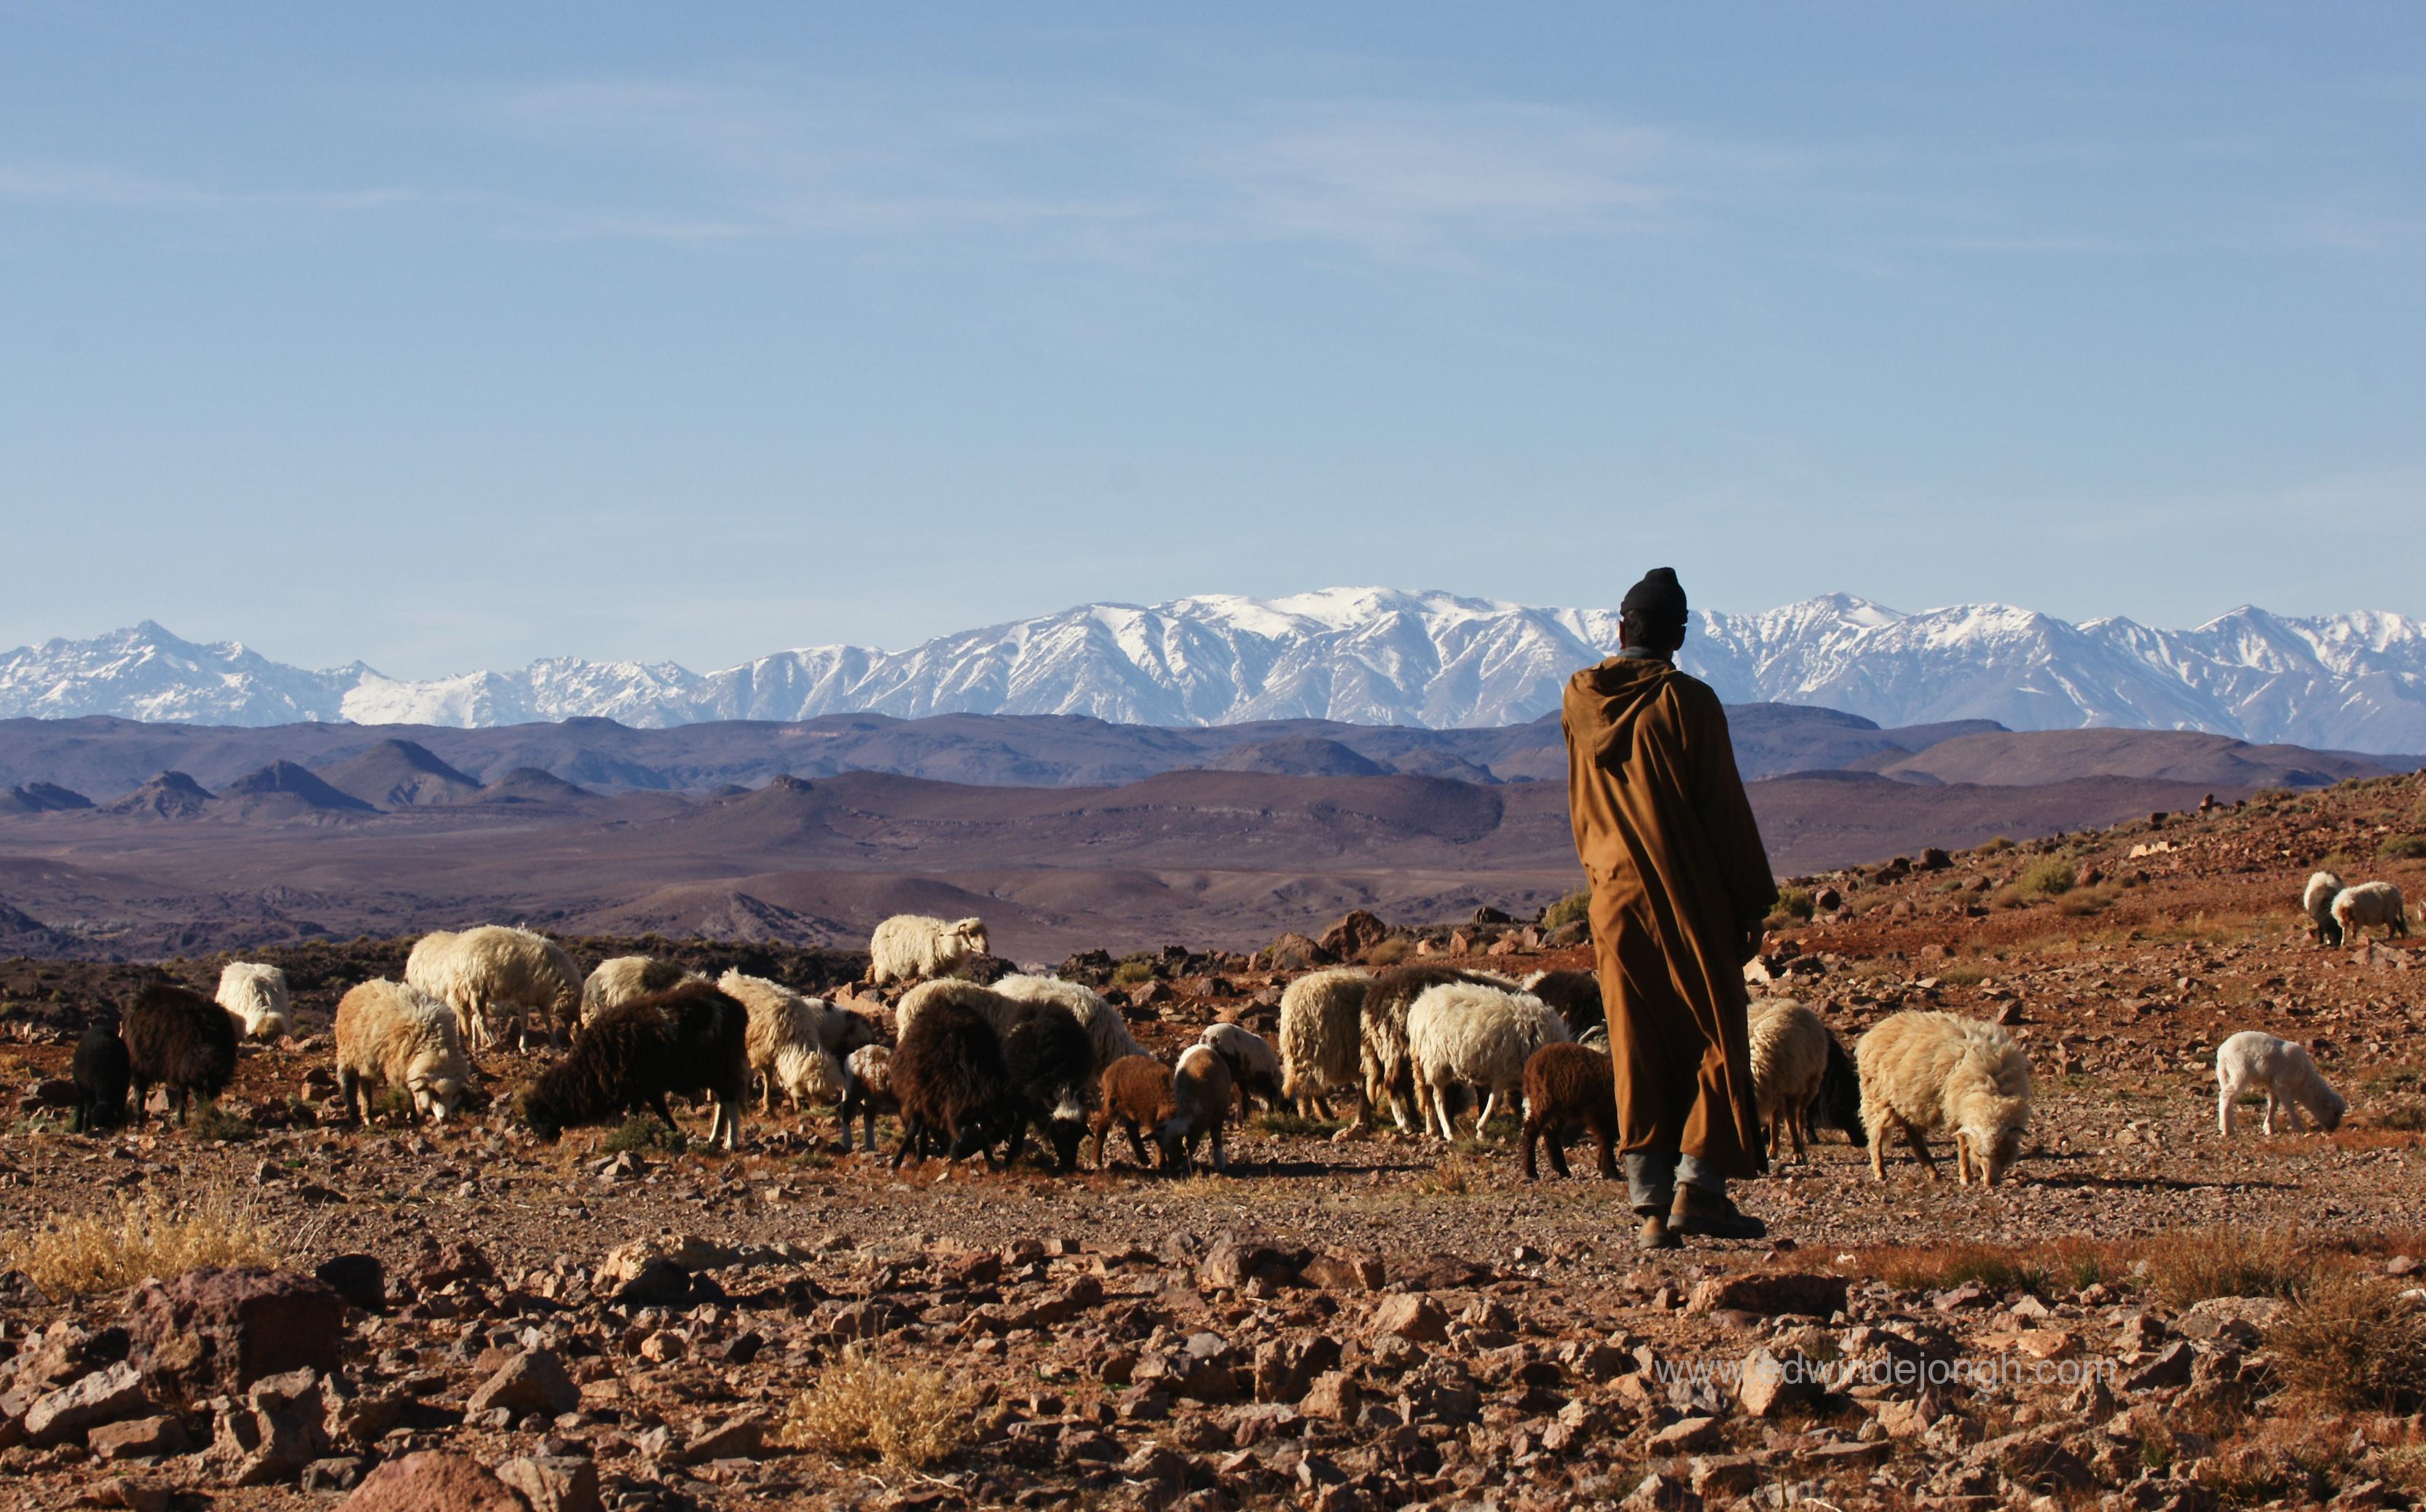 Vallee des Dades, Morocco